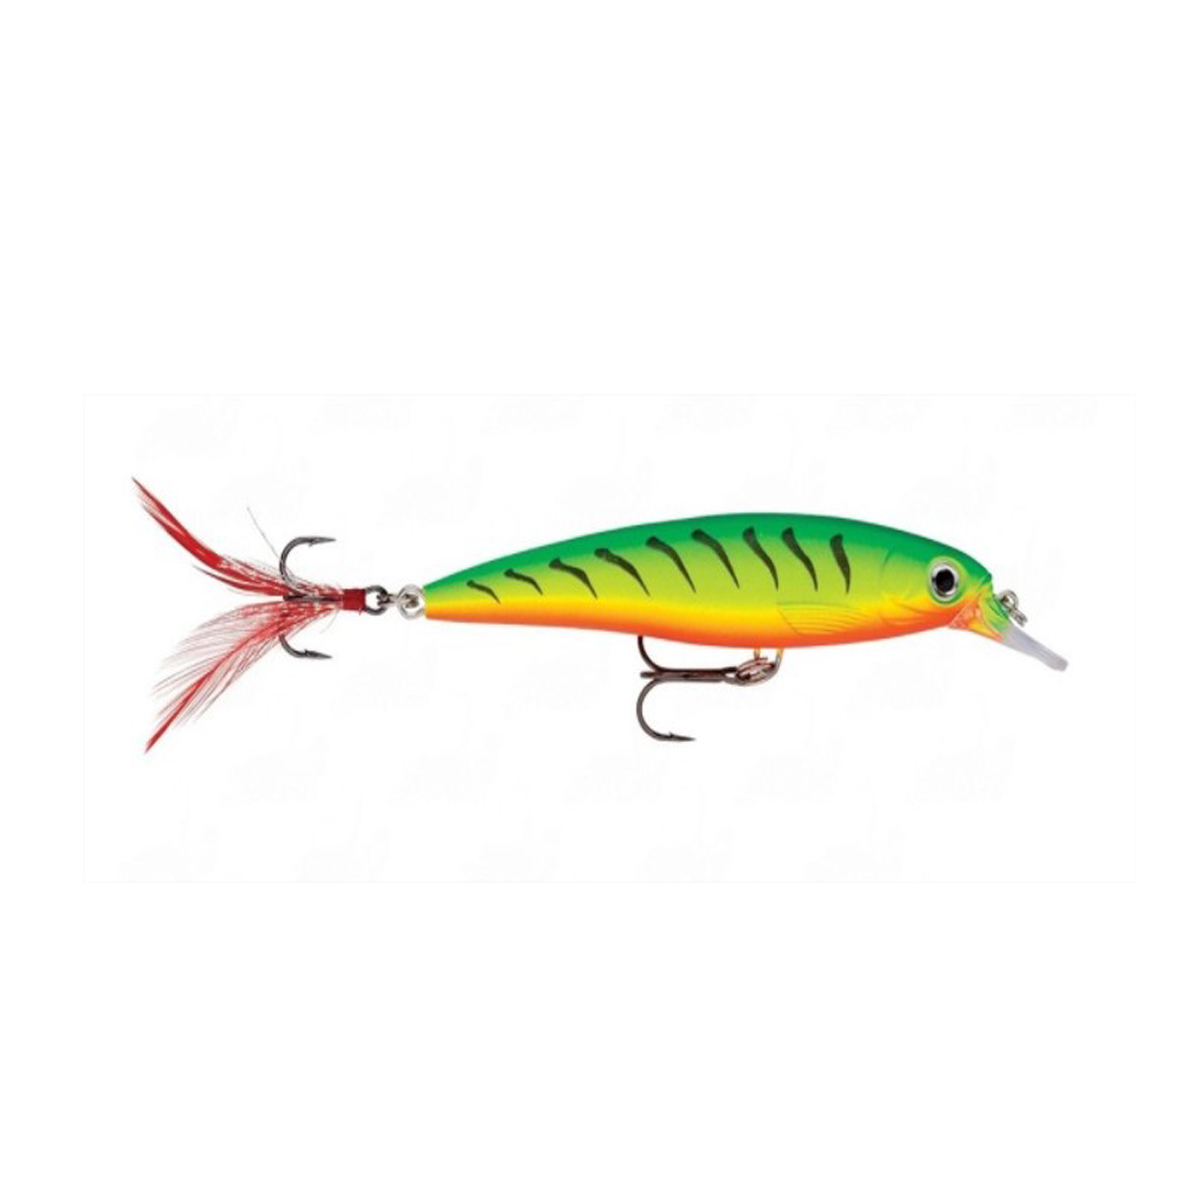 Isca Artificial Xrap 8 cm (7 g)  - Pró Pesca Shop